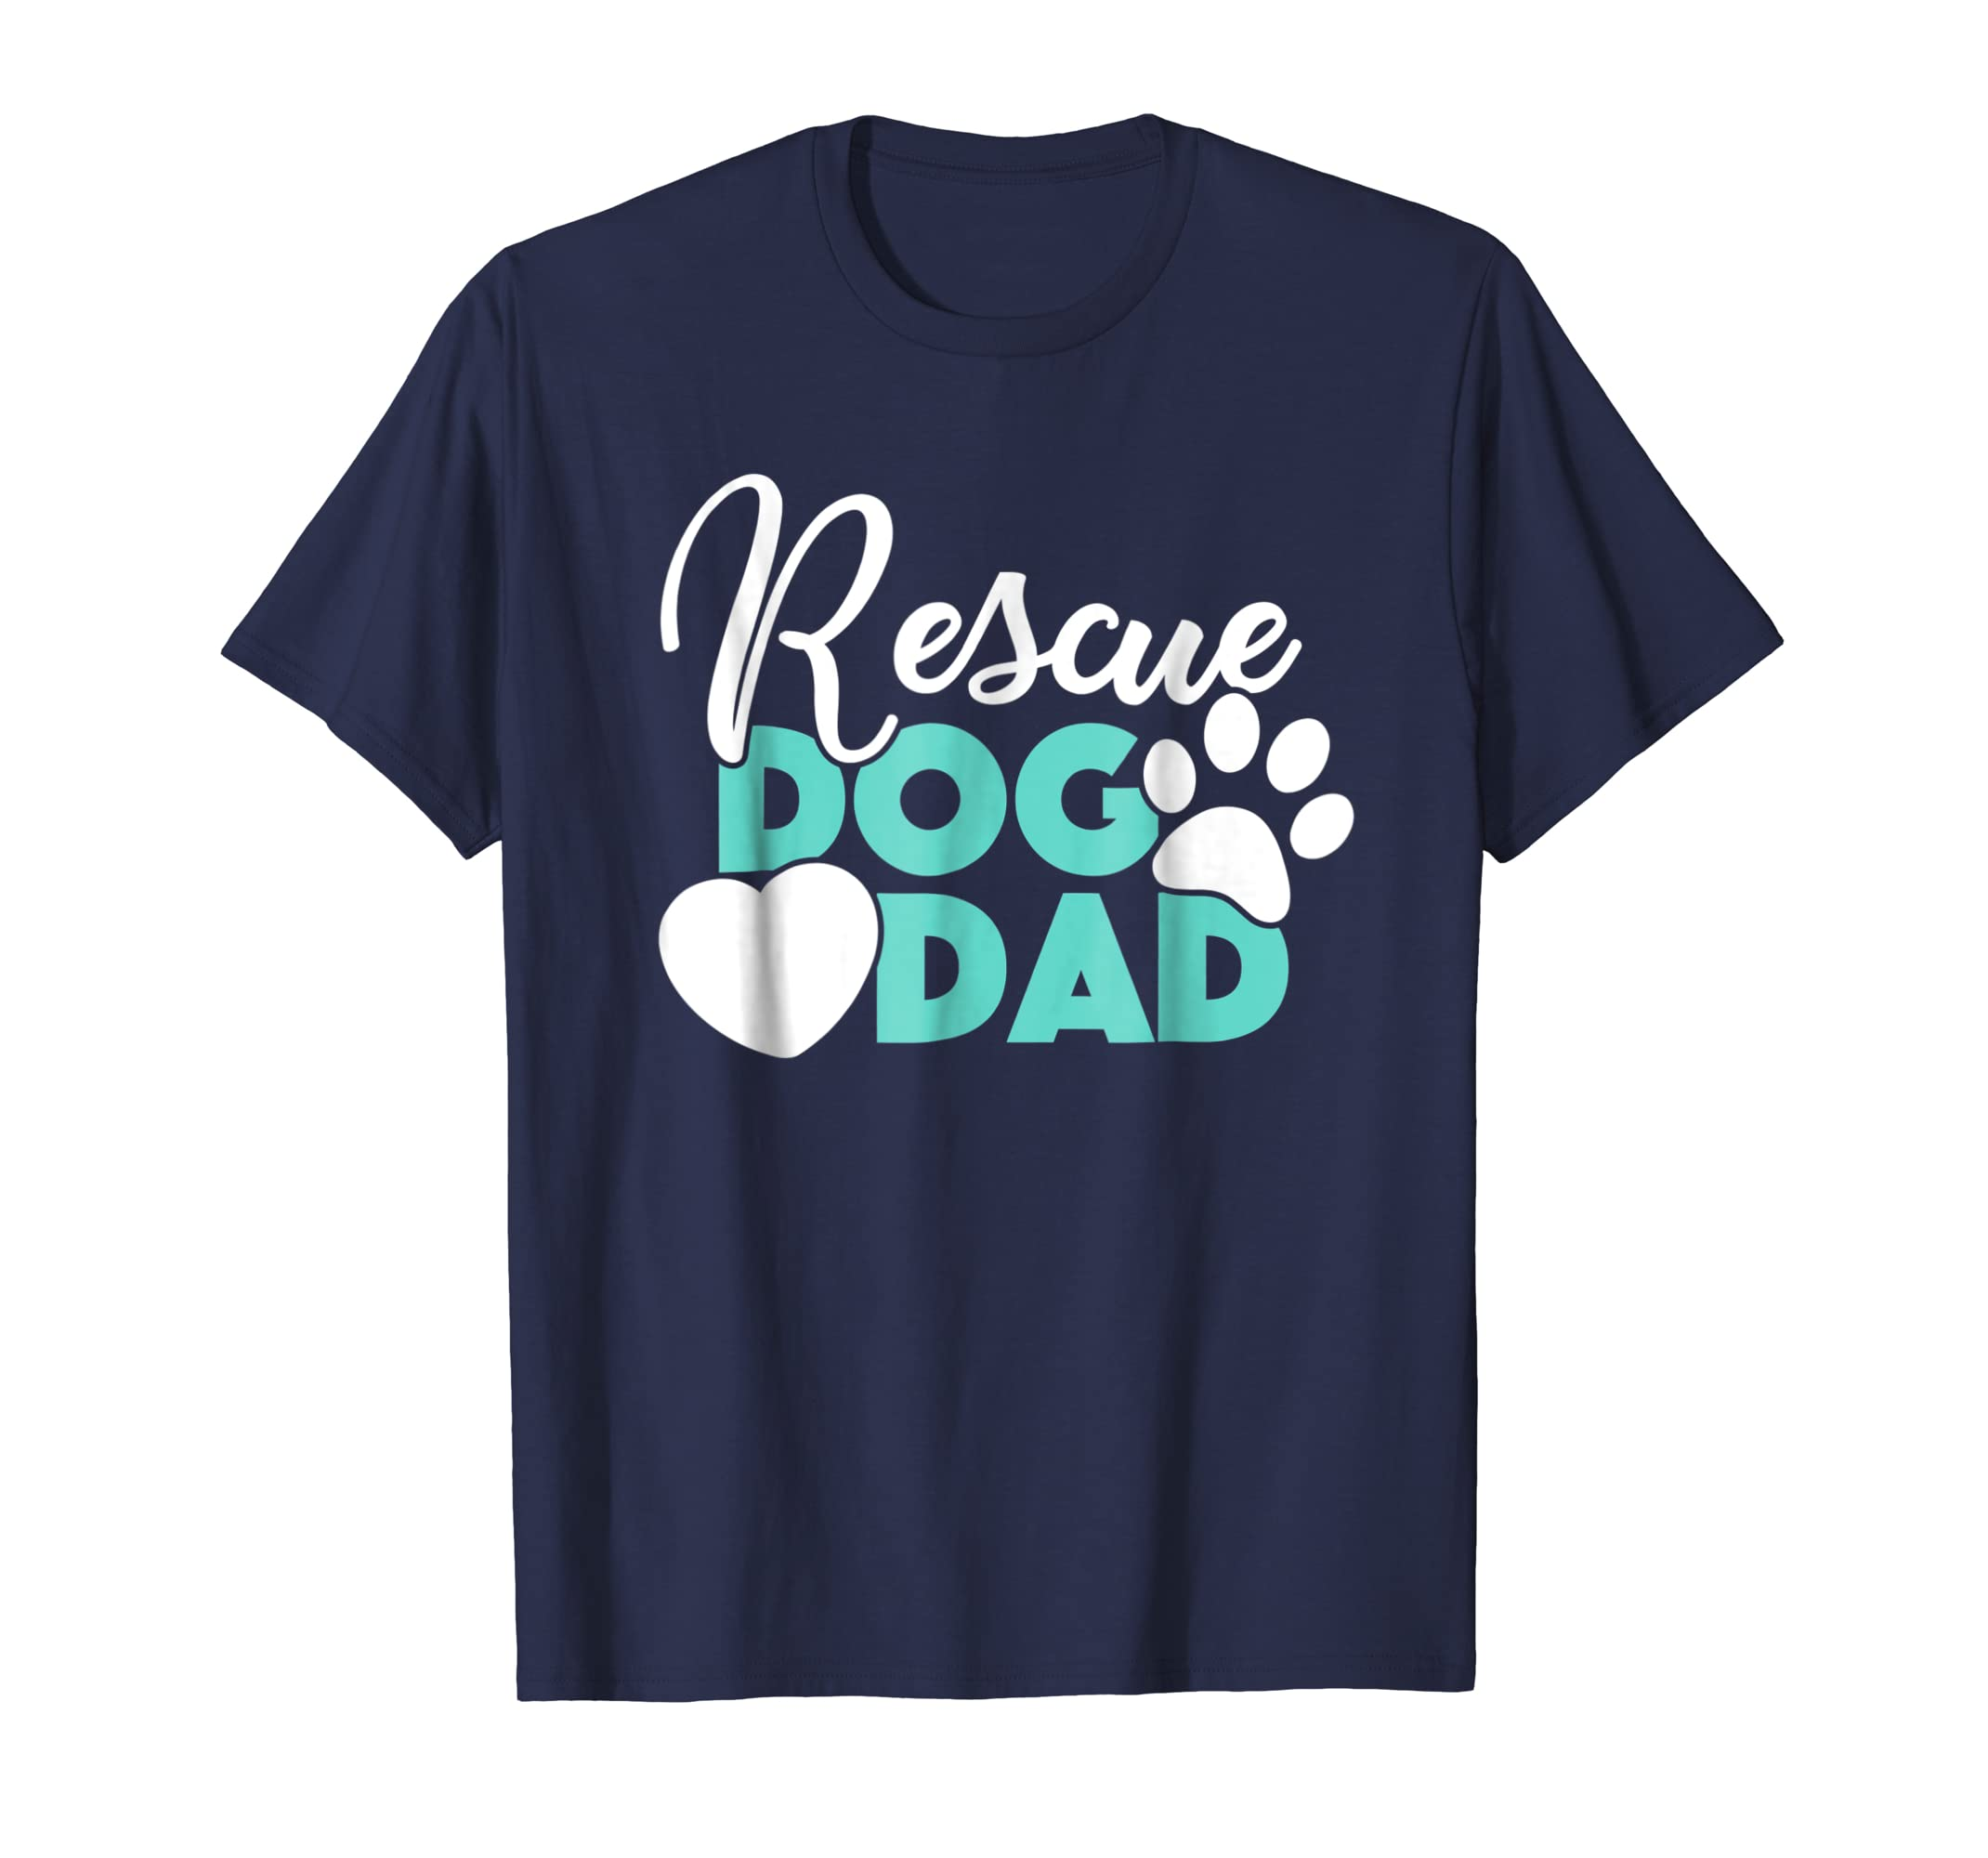 Dog Gift Shirt for Husband or Boyfriend Rescue Dog Dad Tee-AZP